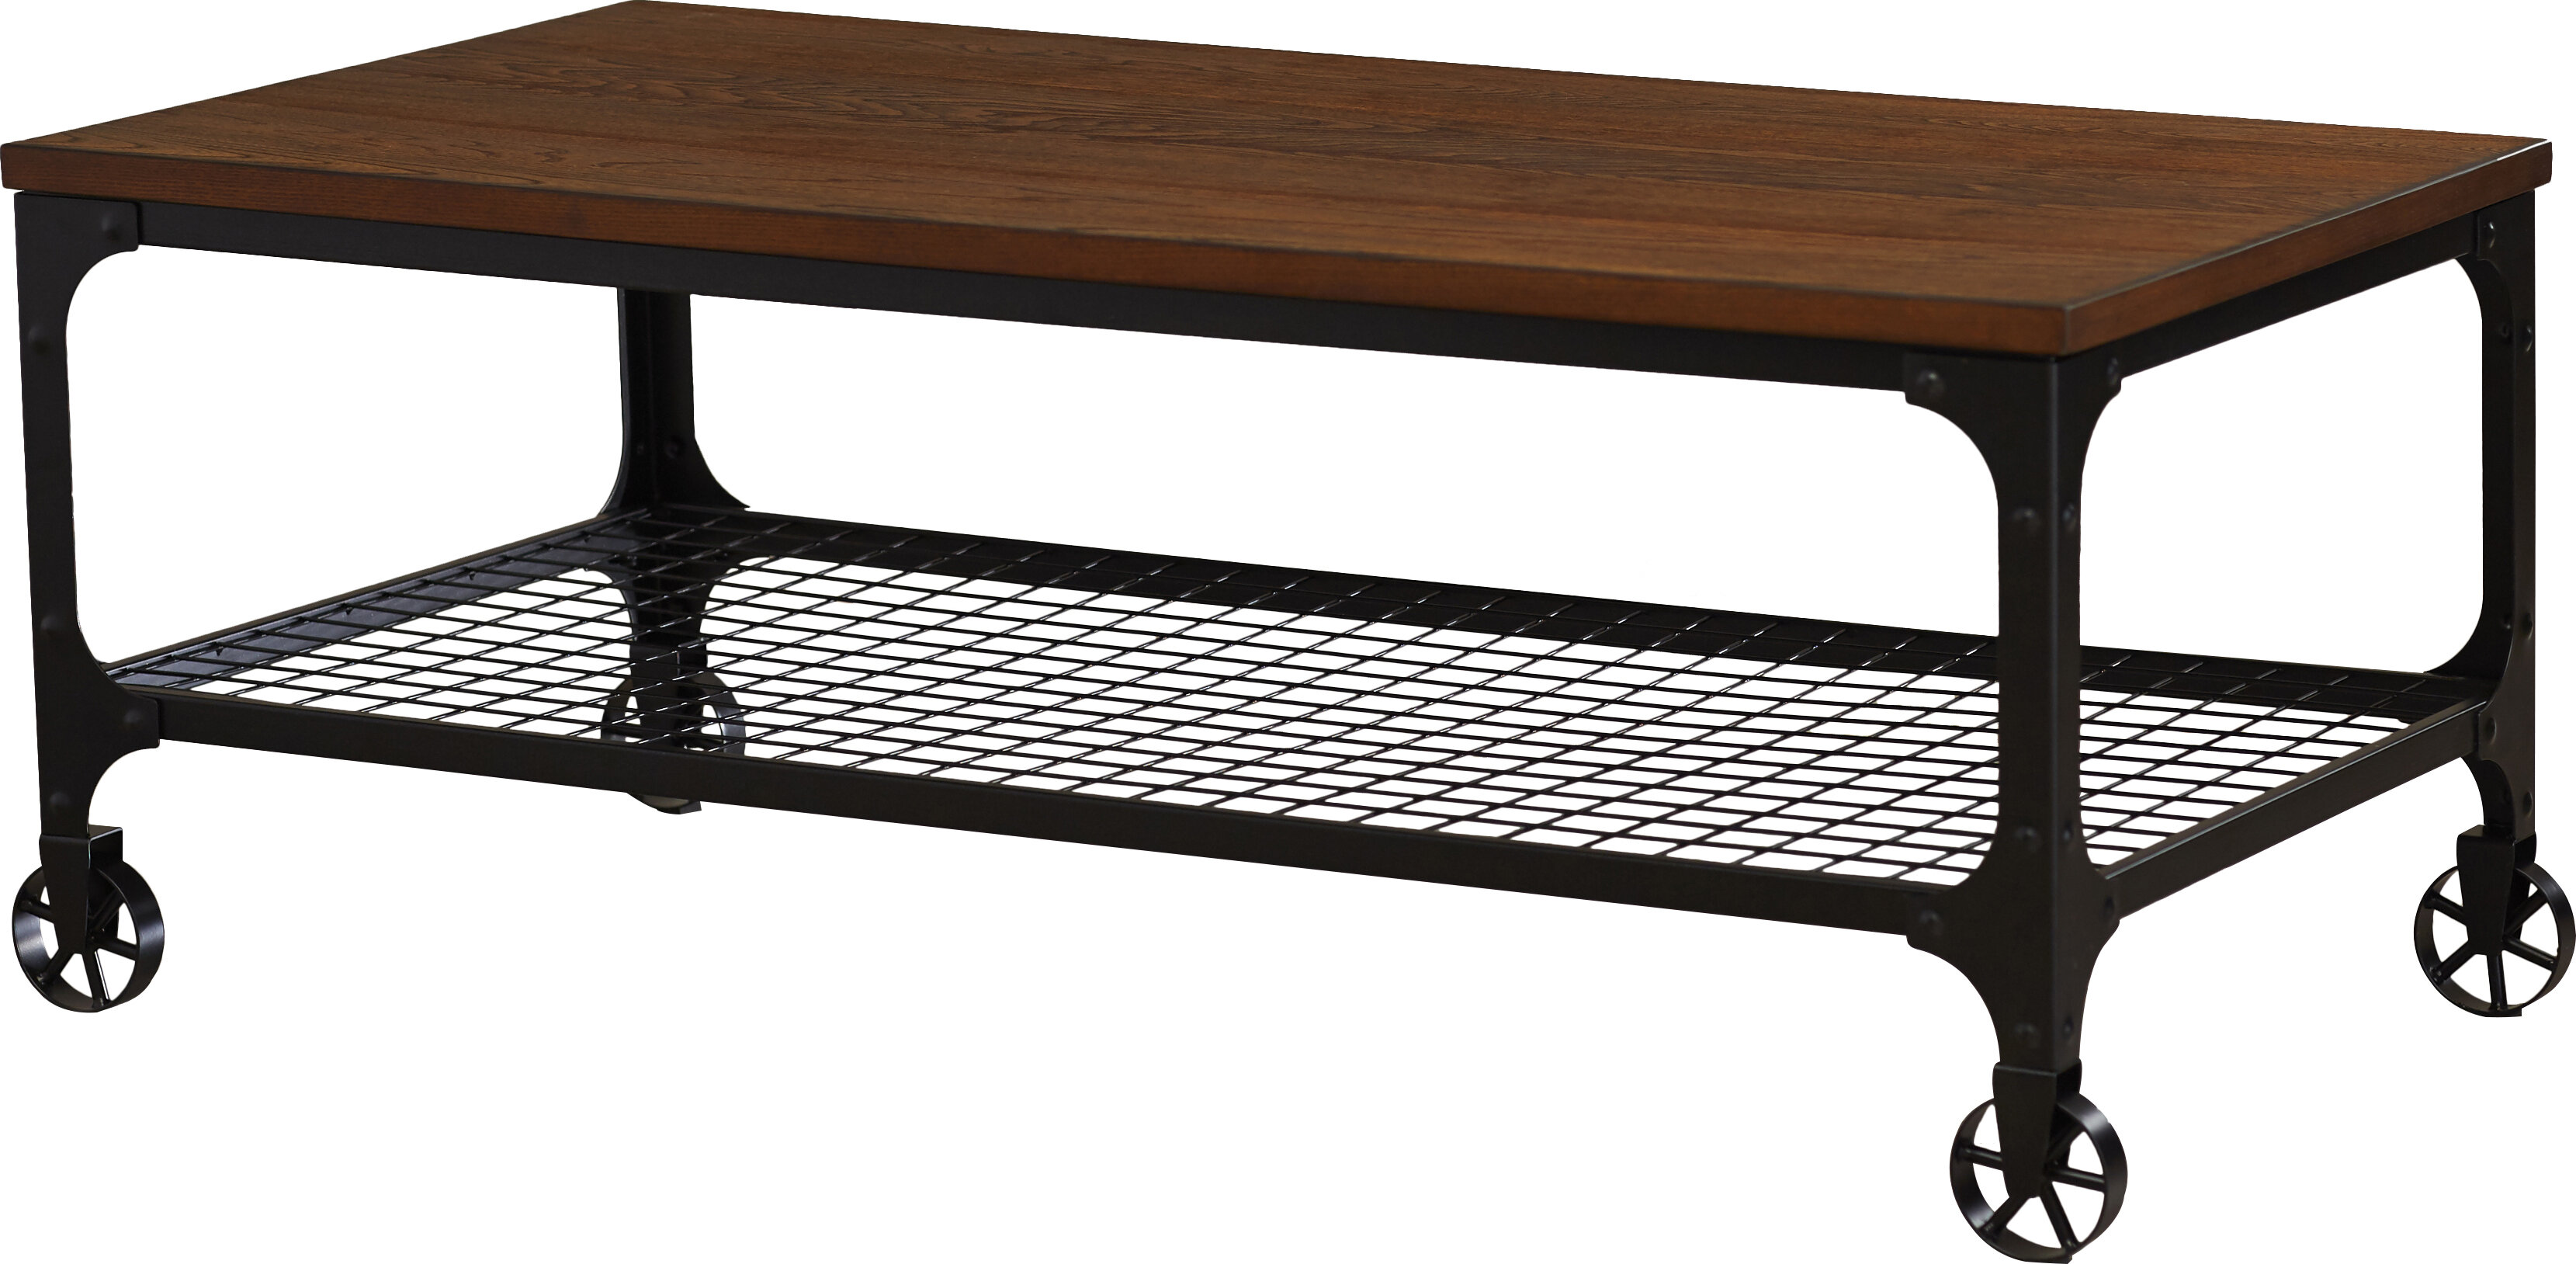 Mercury Row Corvus Rectangle Industrial Coffee Table